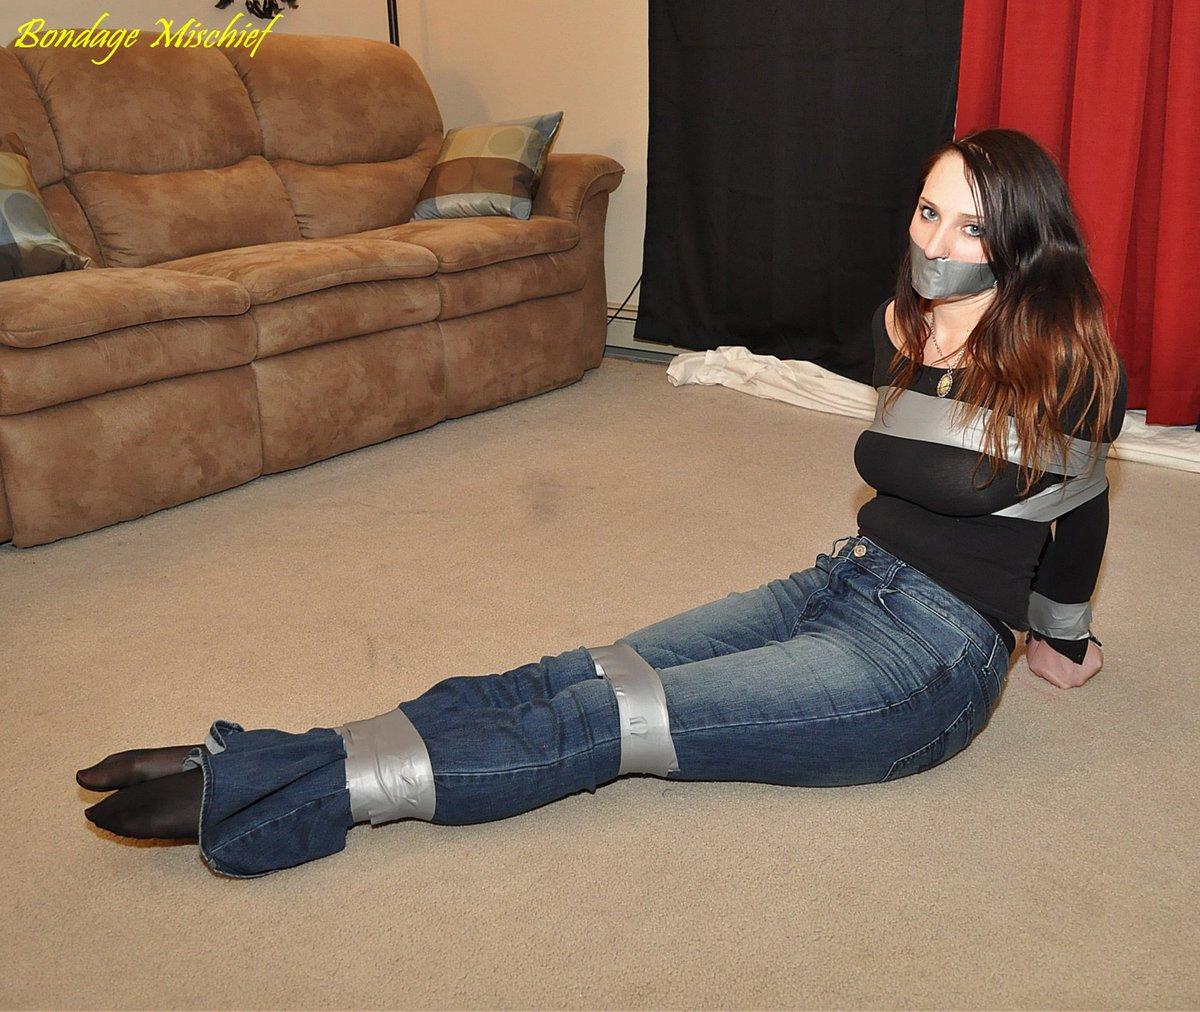 Pantyhose bondage girl next door